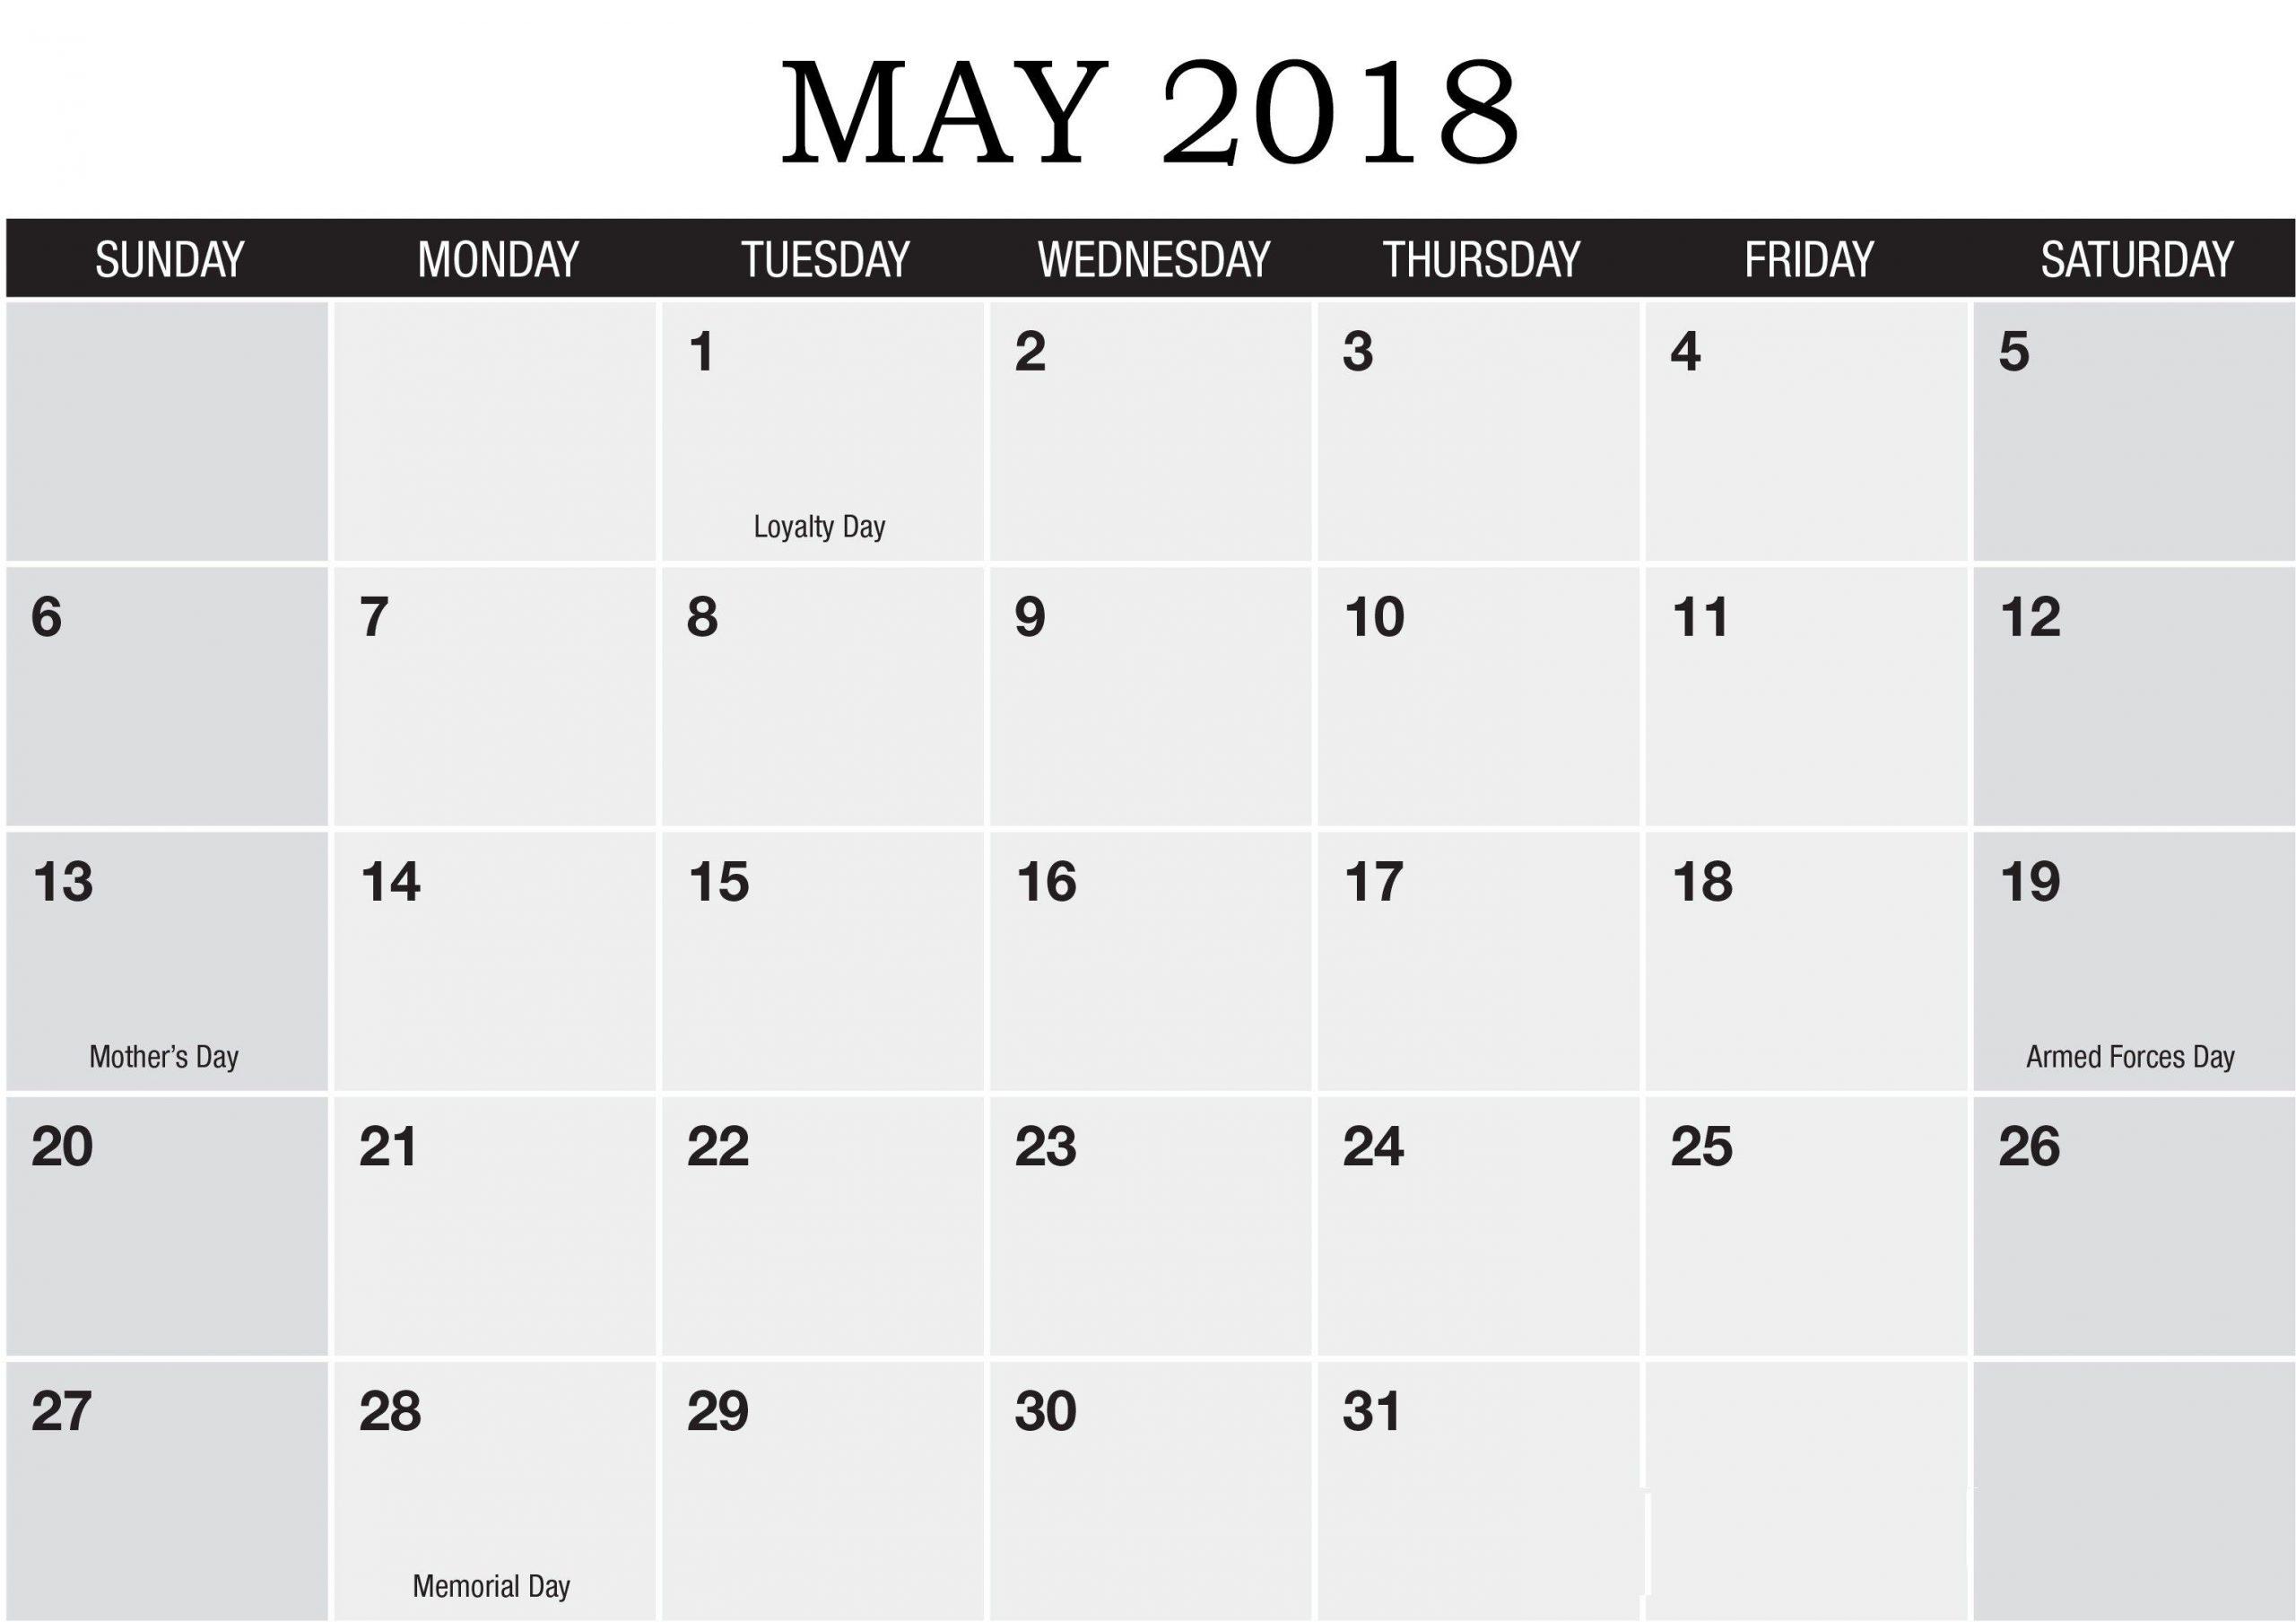 Free Printable Calendar Google In 2020 | Free Printable with Google Free Printable Calendars 2020